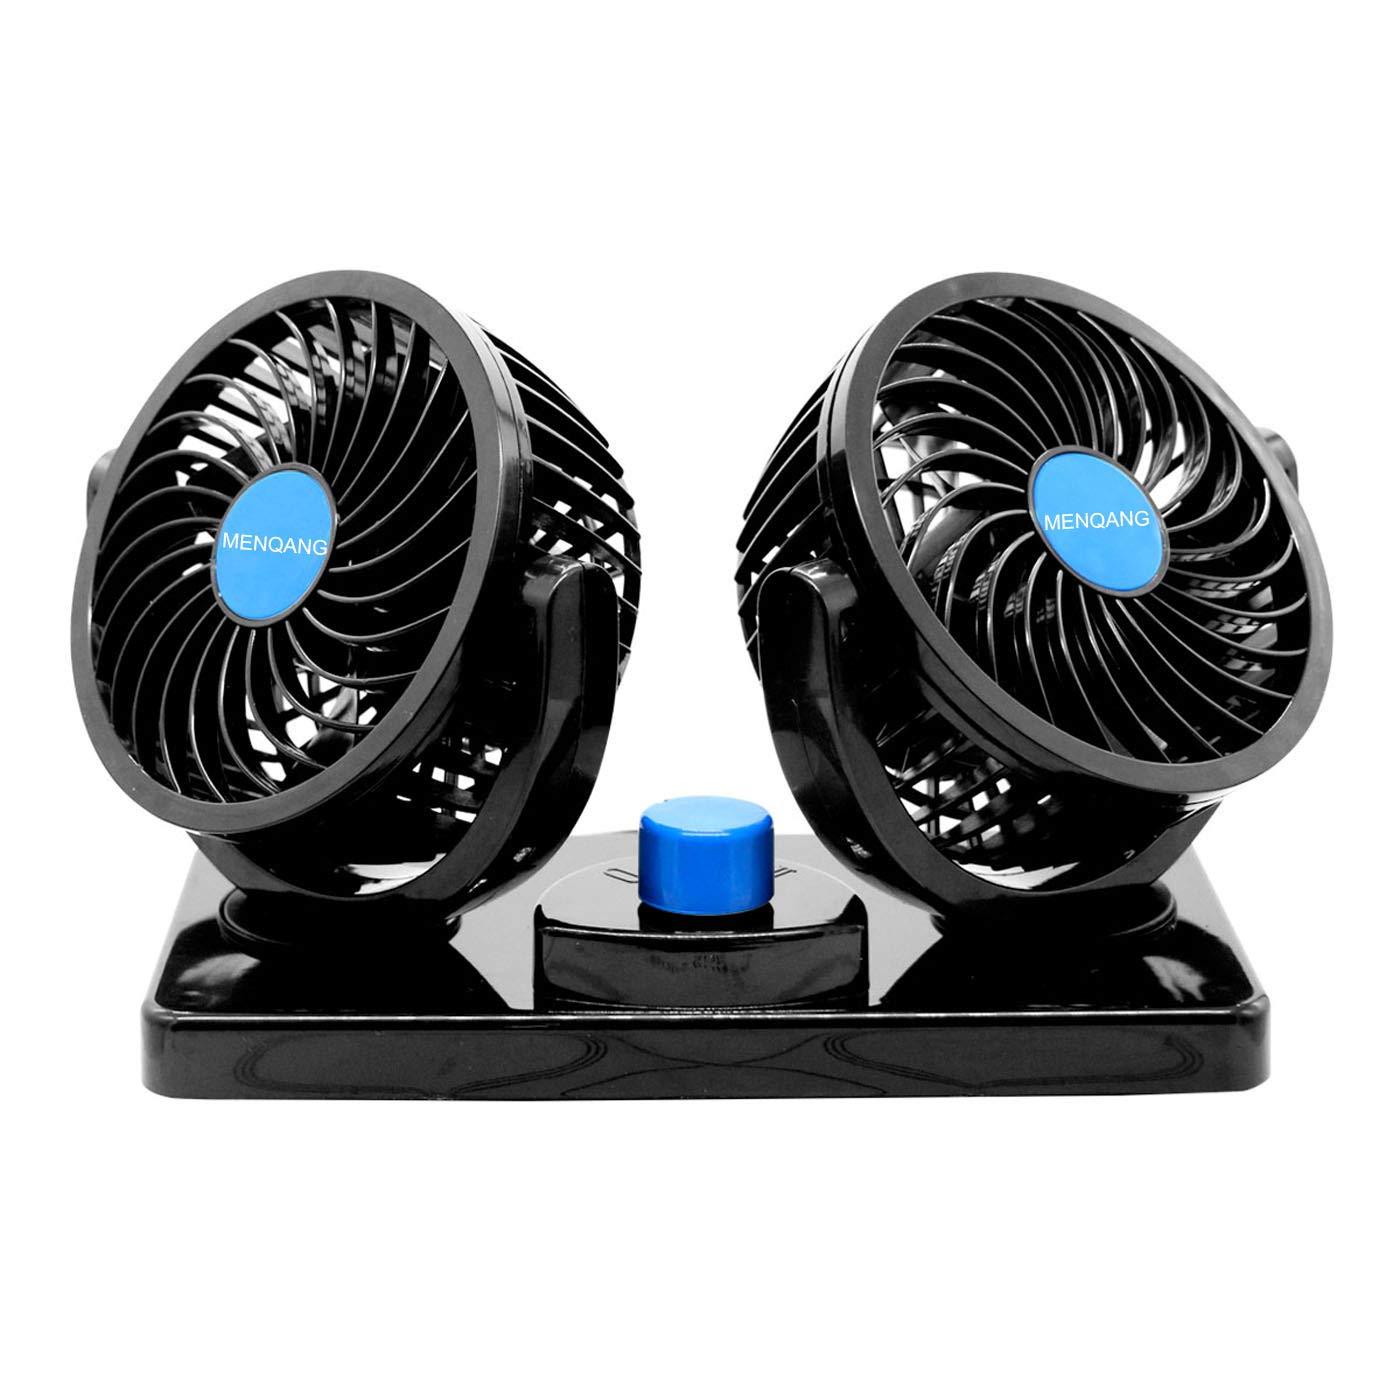 MENQANG 12V Electric Car Cooling Fan 360 Degree Rotatable Dual Heads Air Circulator Fan Manual Rotation 2 Speed Dual Head